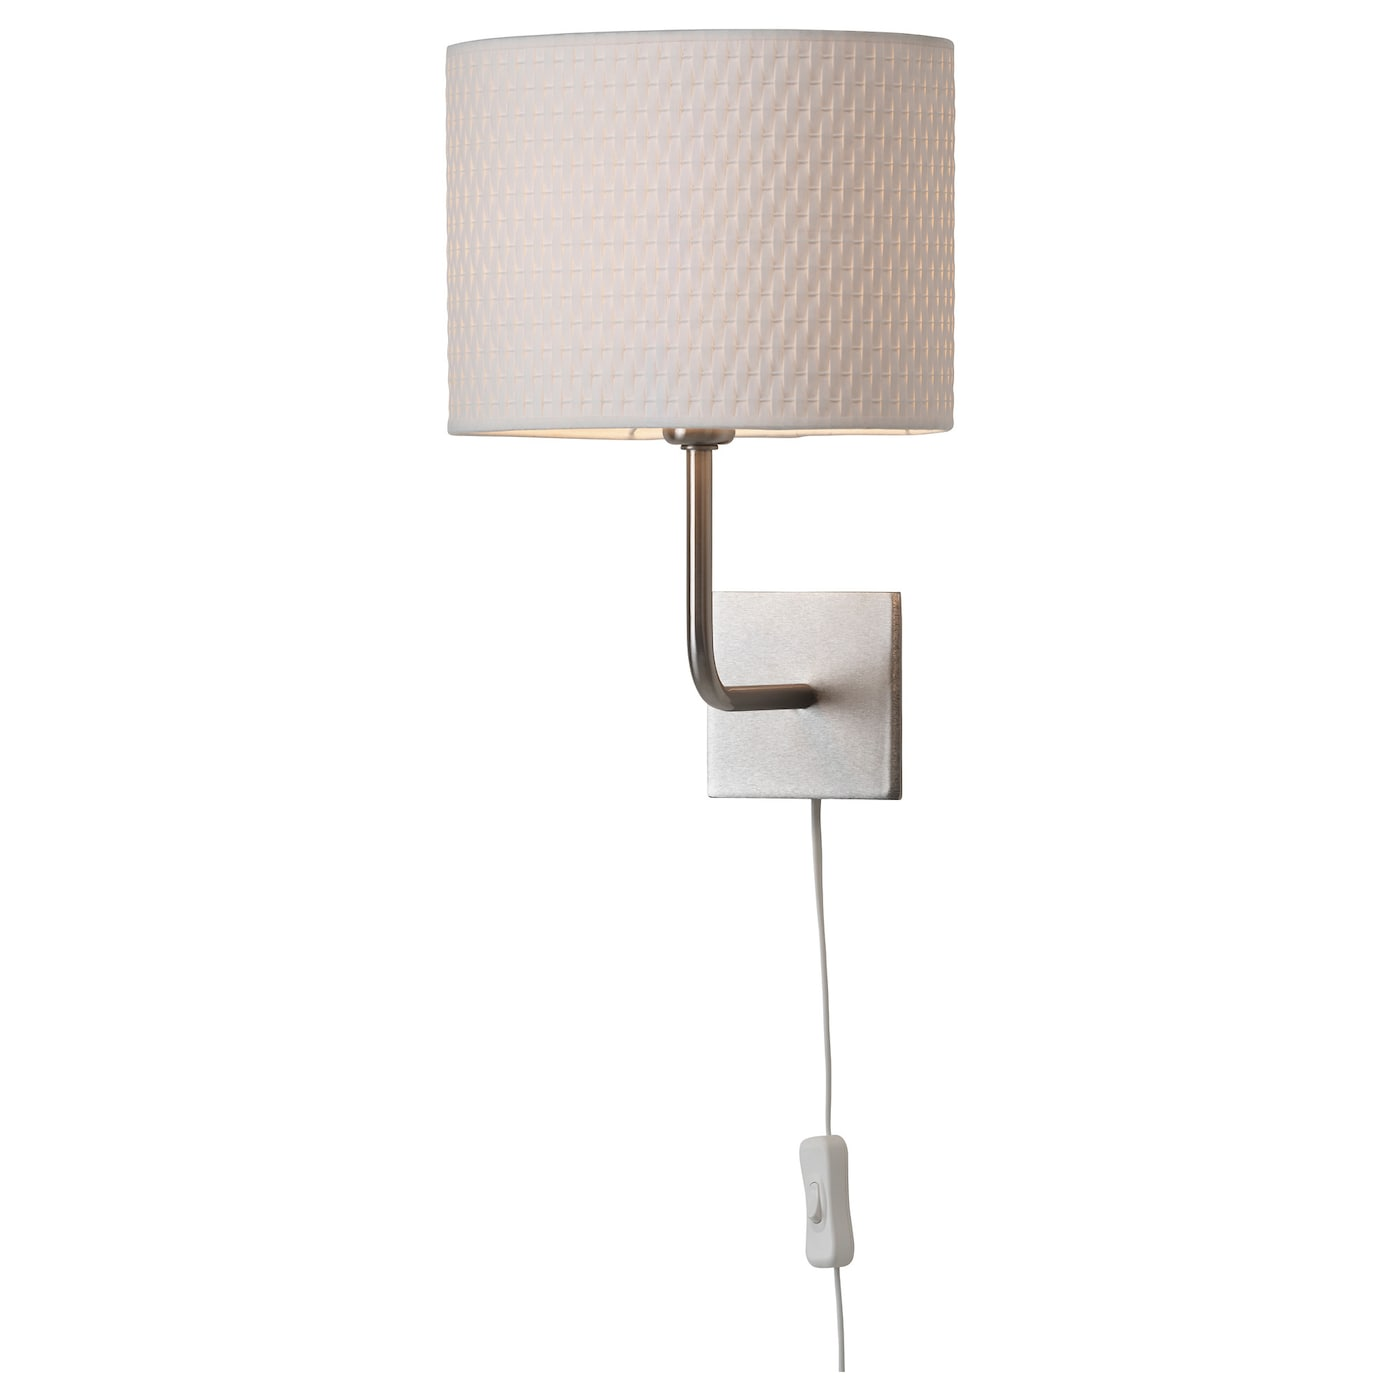 al ng applique nickel blanc ikea. Black Bedroom Furniture Sets. Home Design Ideas